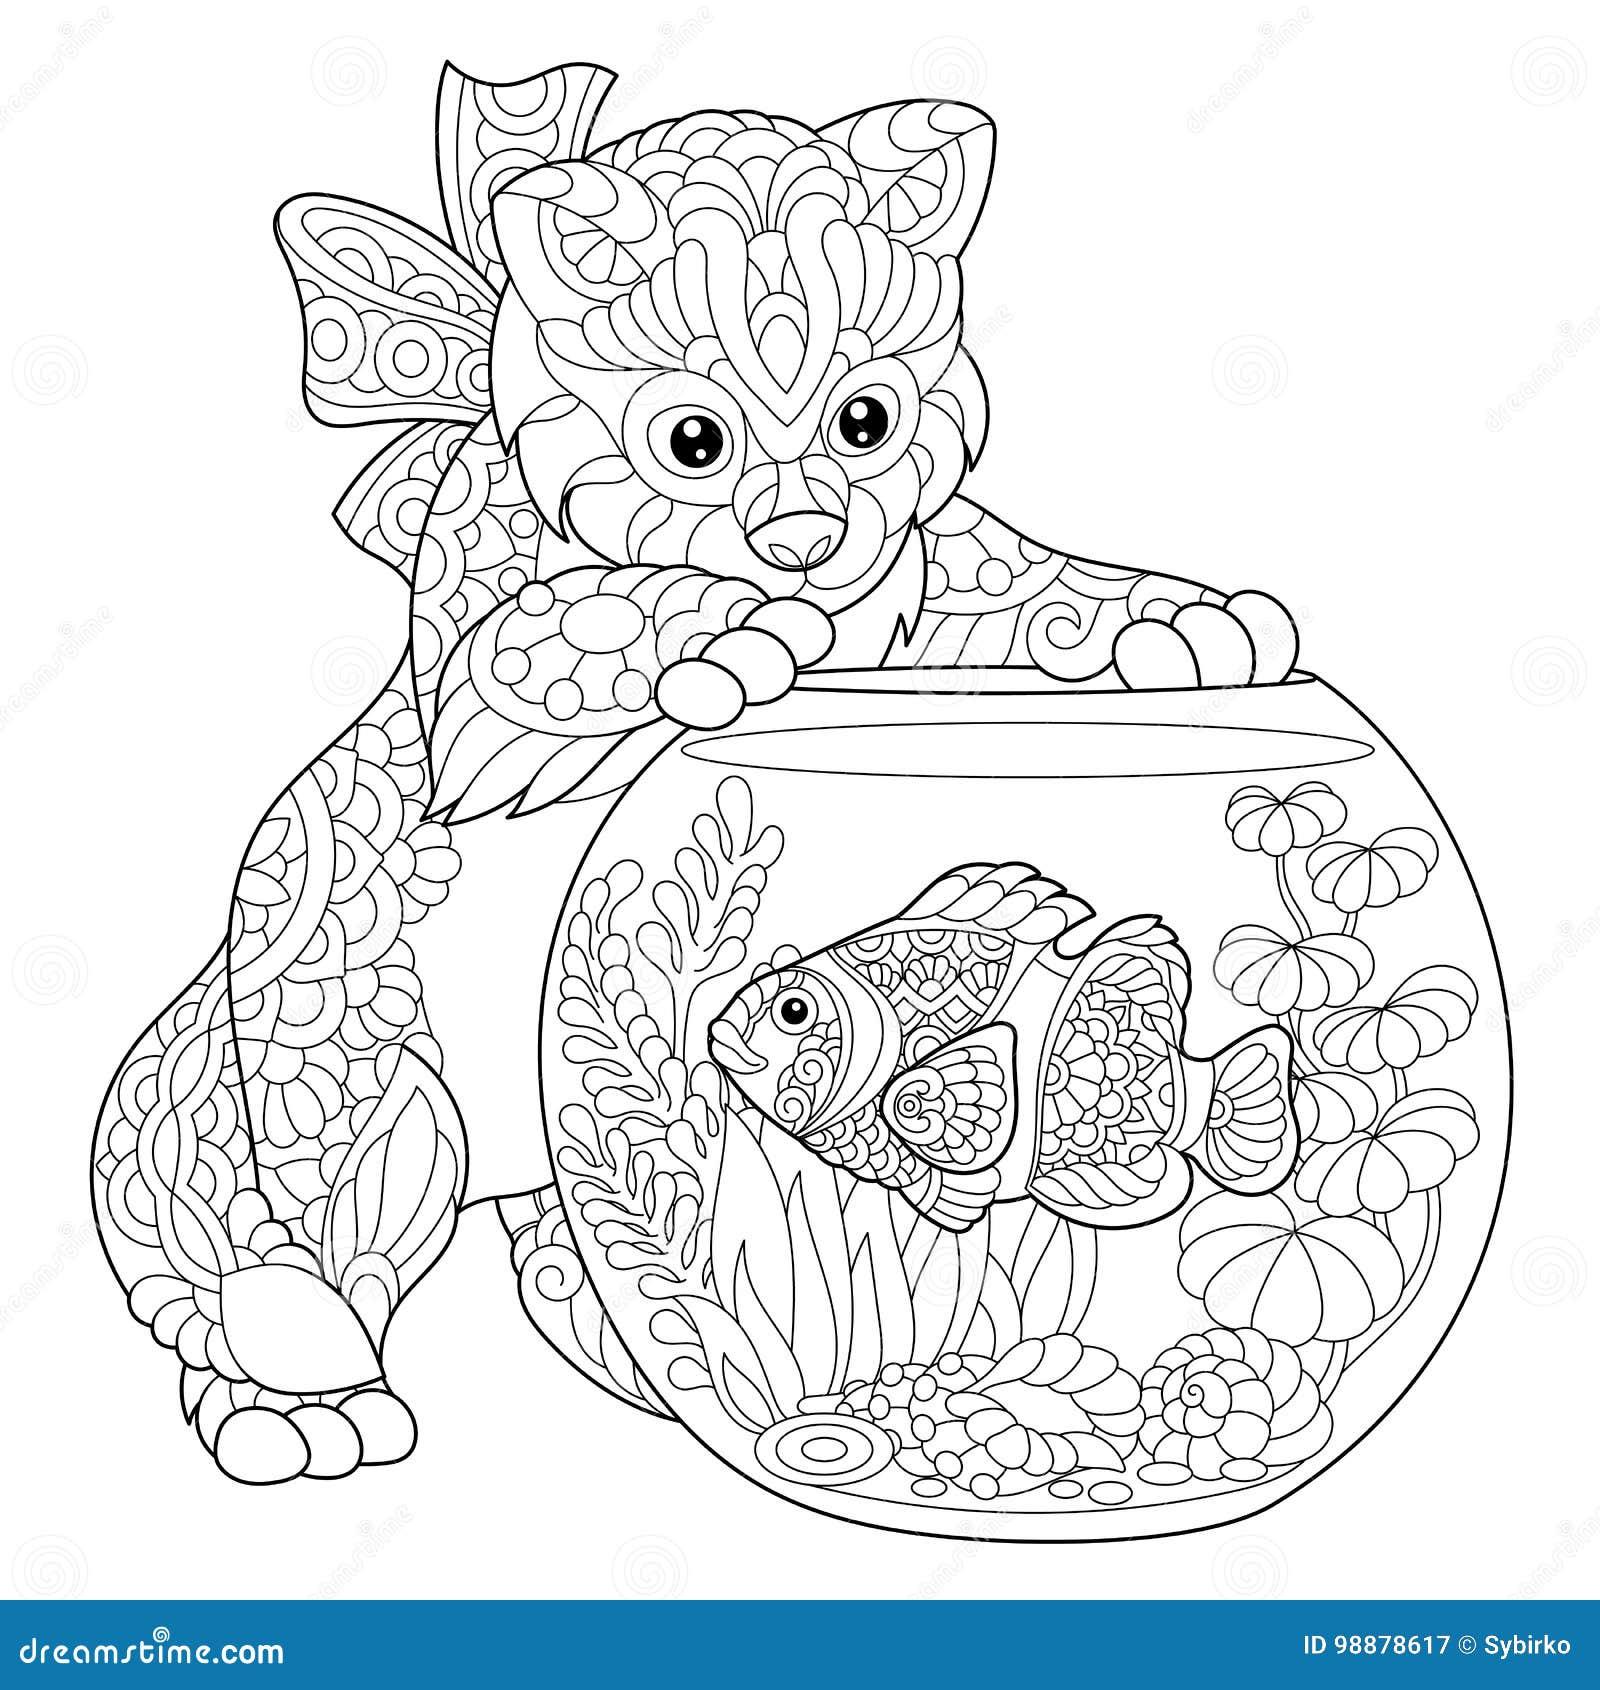 Zentangle Stylized Kitten And Clown Fish Stock Vector - Illustration ...